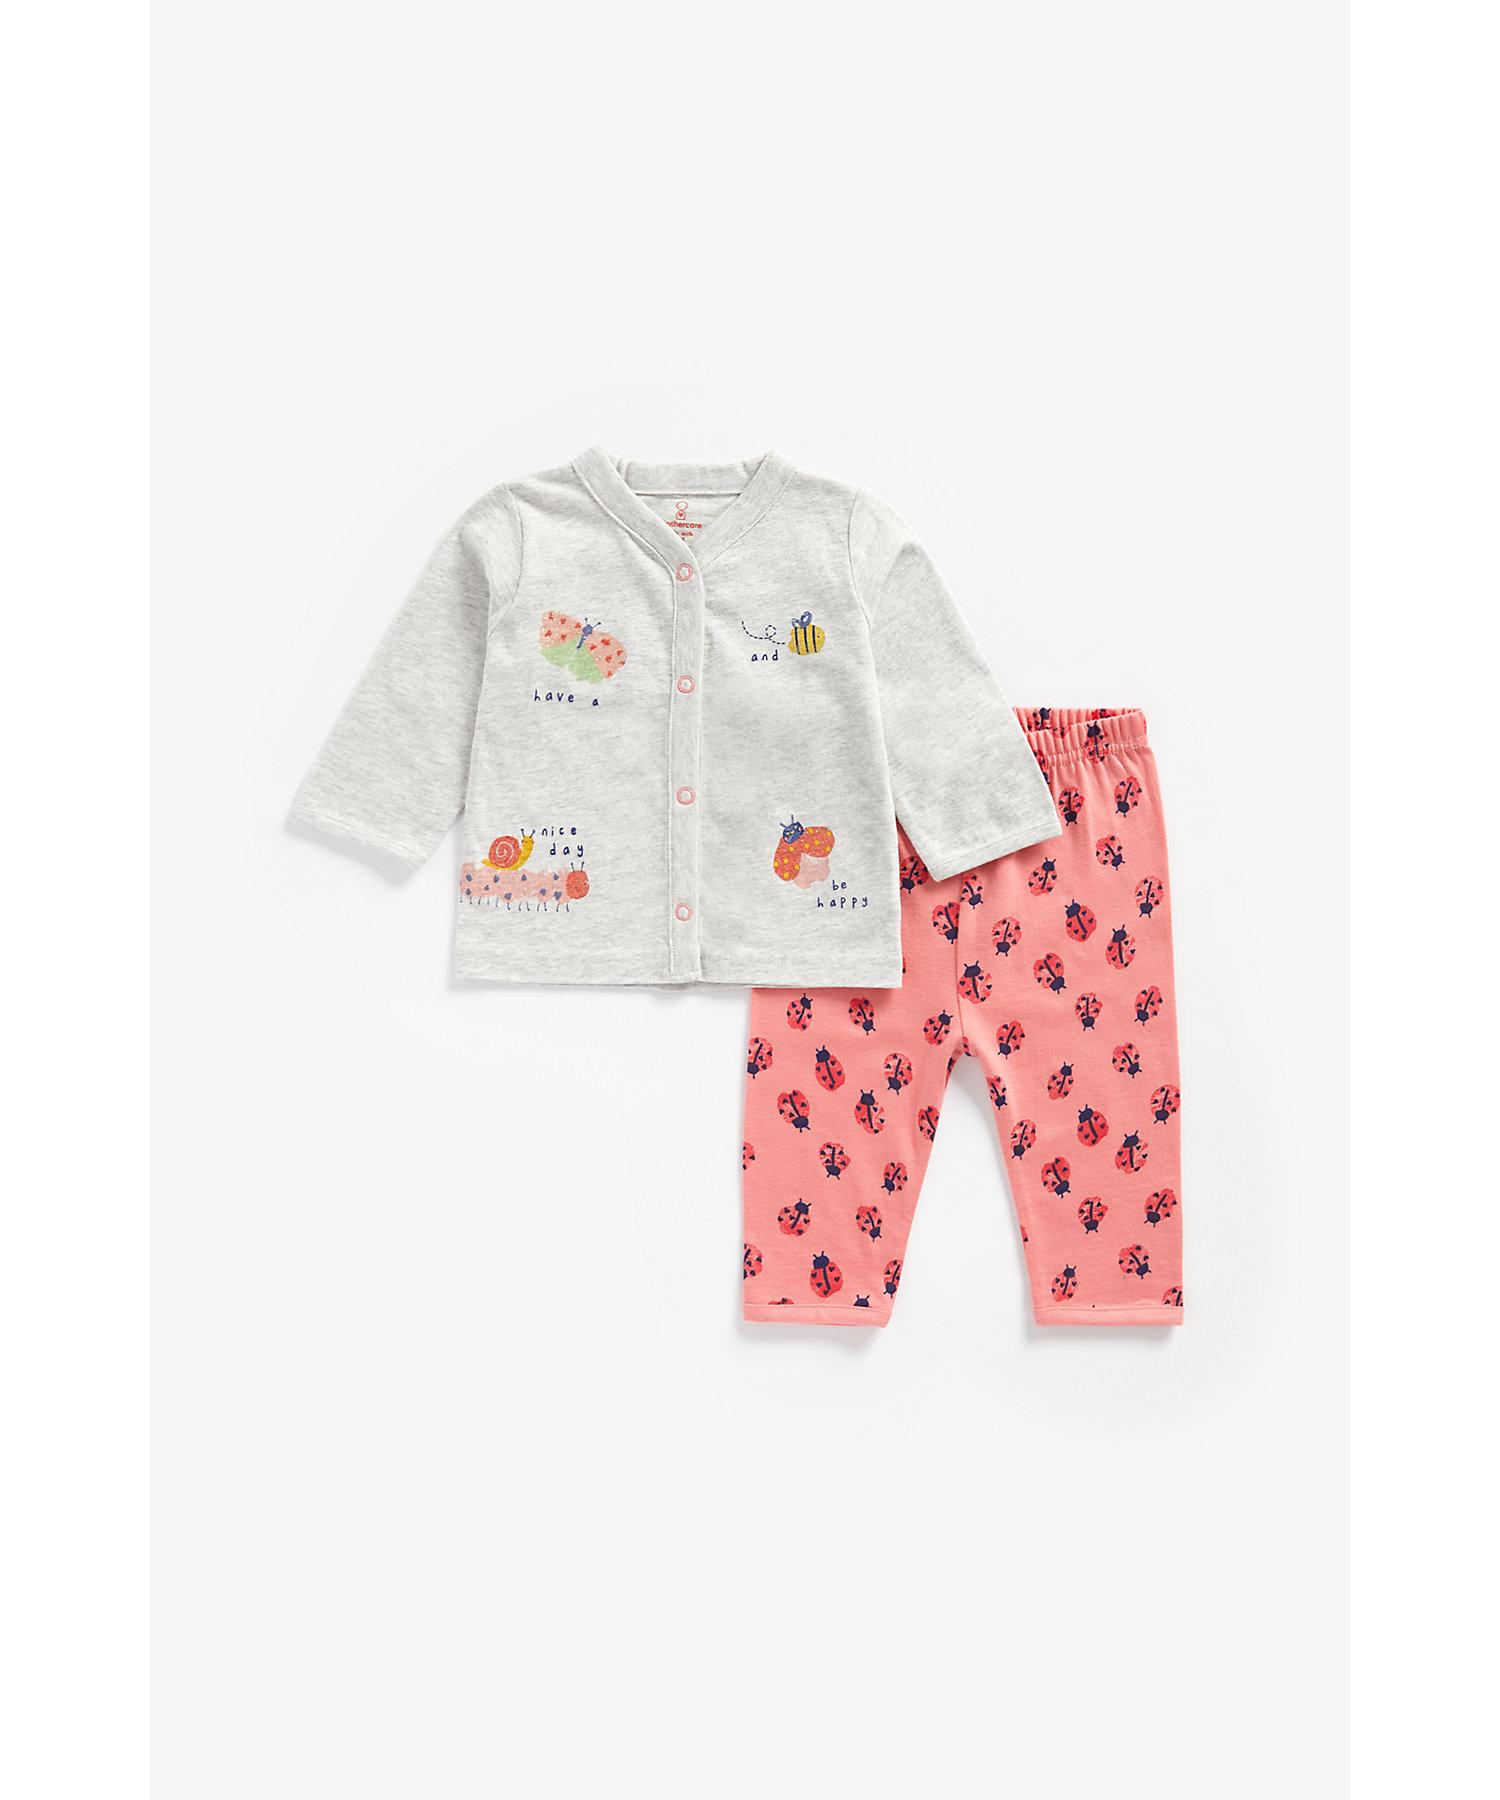 Mothercare | Girls Full Sleeves Pyjama Set Bug Print - Multicolor